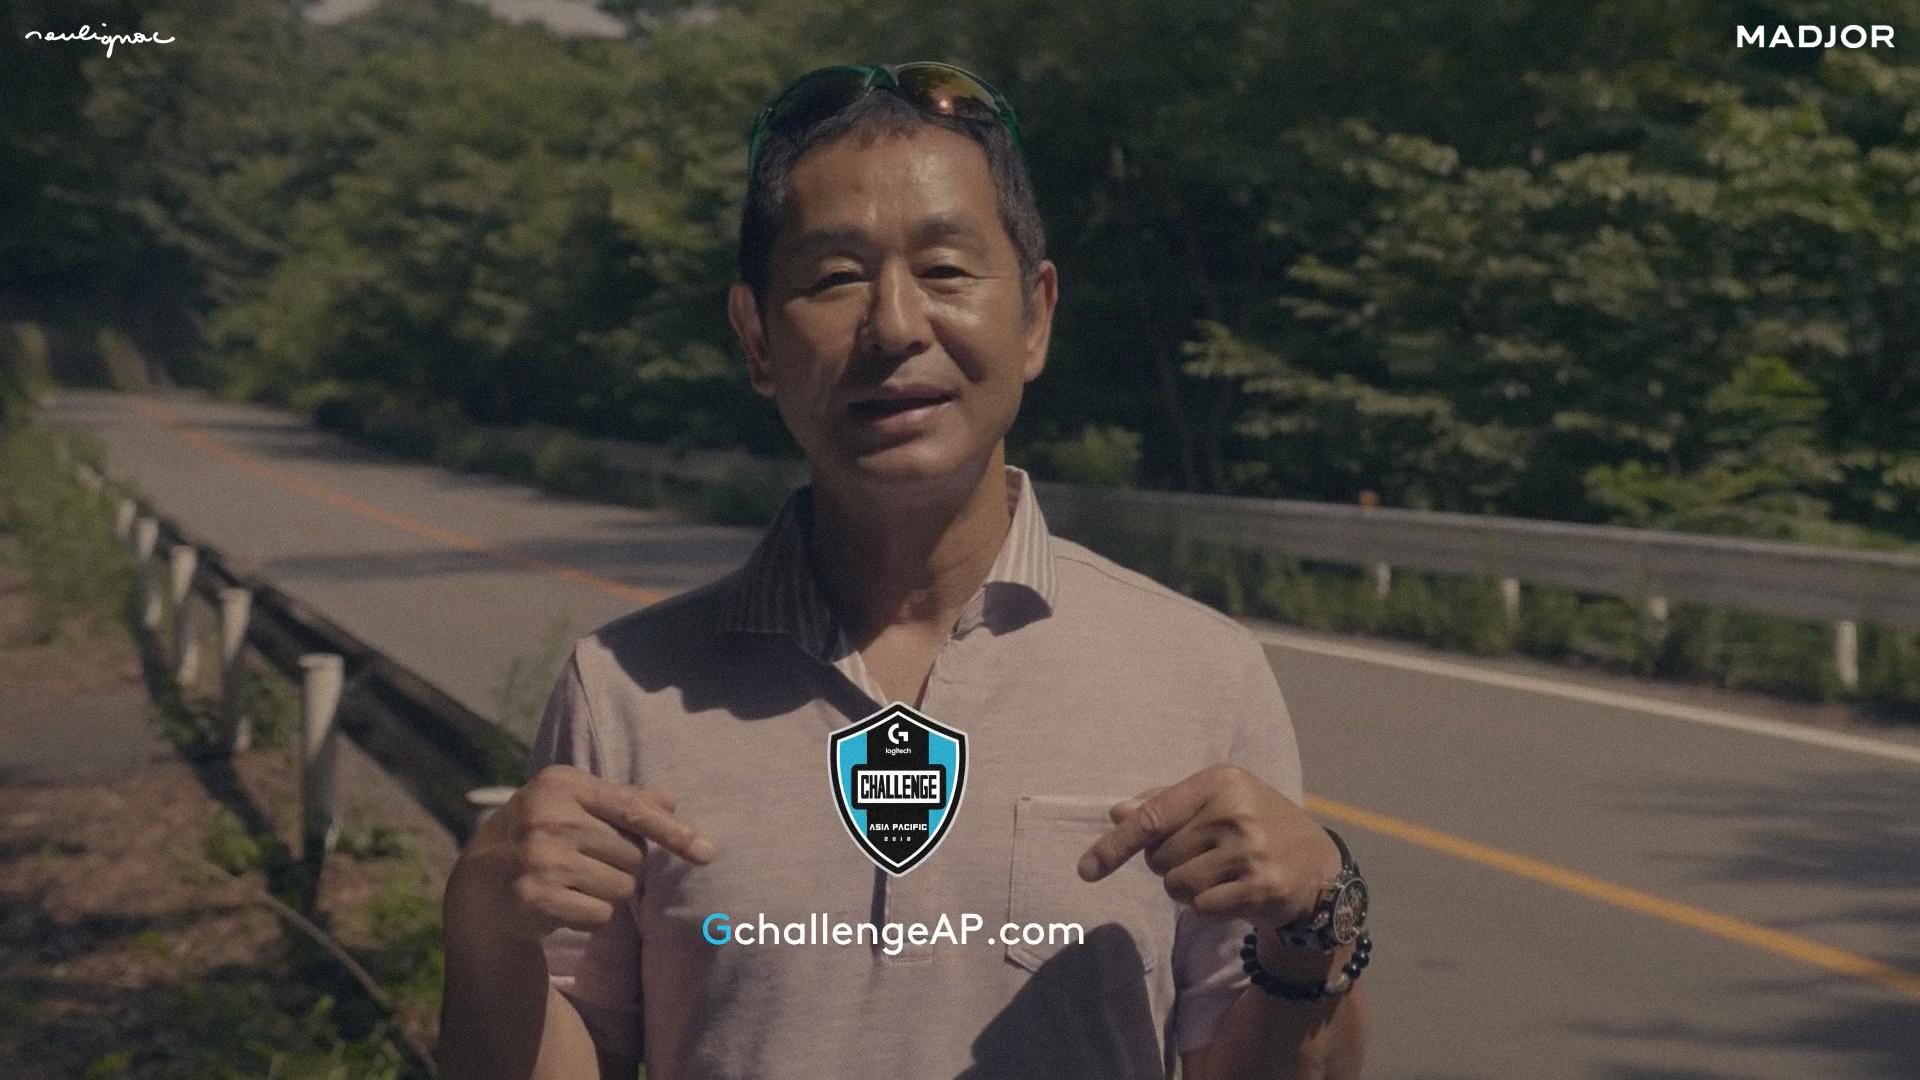 Logitech China - Global Campaign Keiichi Tsuchiya - The King of Drift - Francois Soulignac - Digital Creative & Art Direction - MADJOR Labbrand Shanghai, China